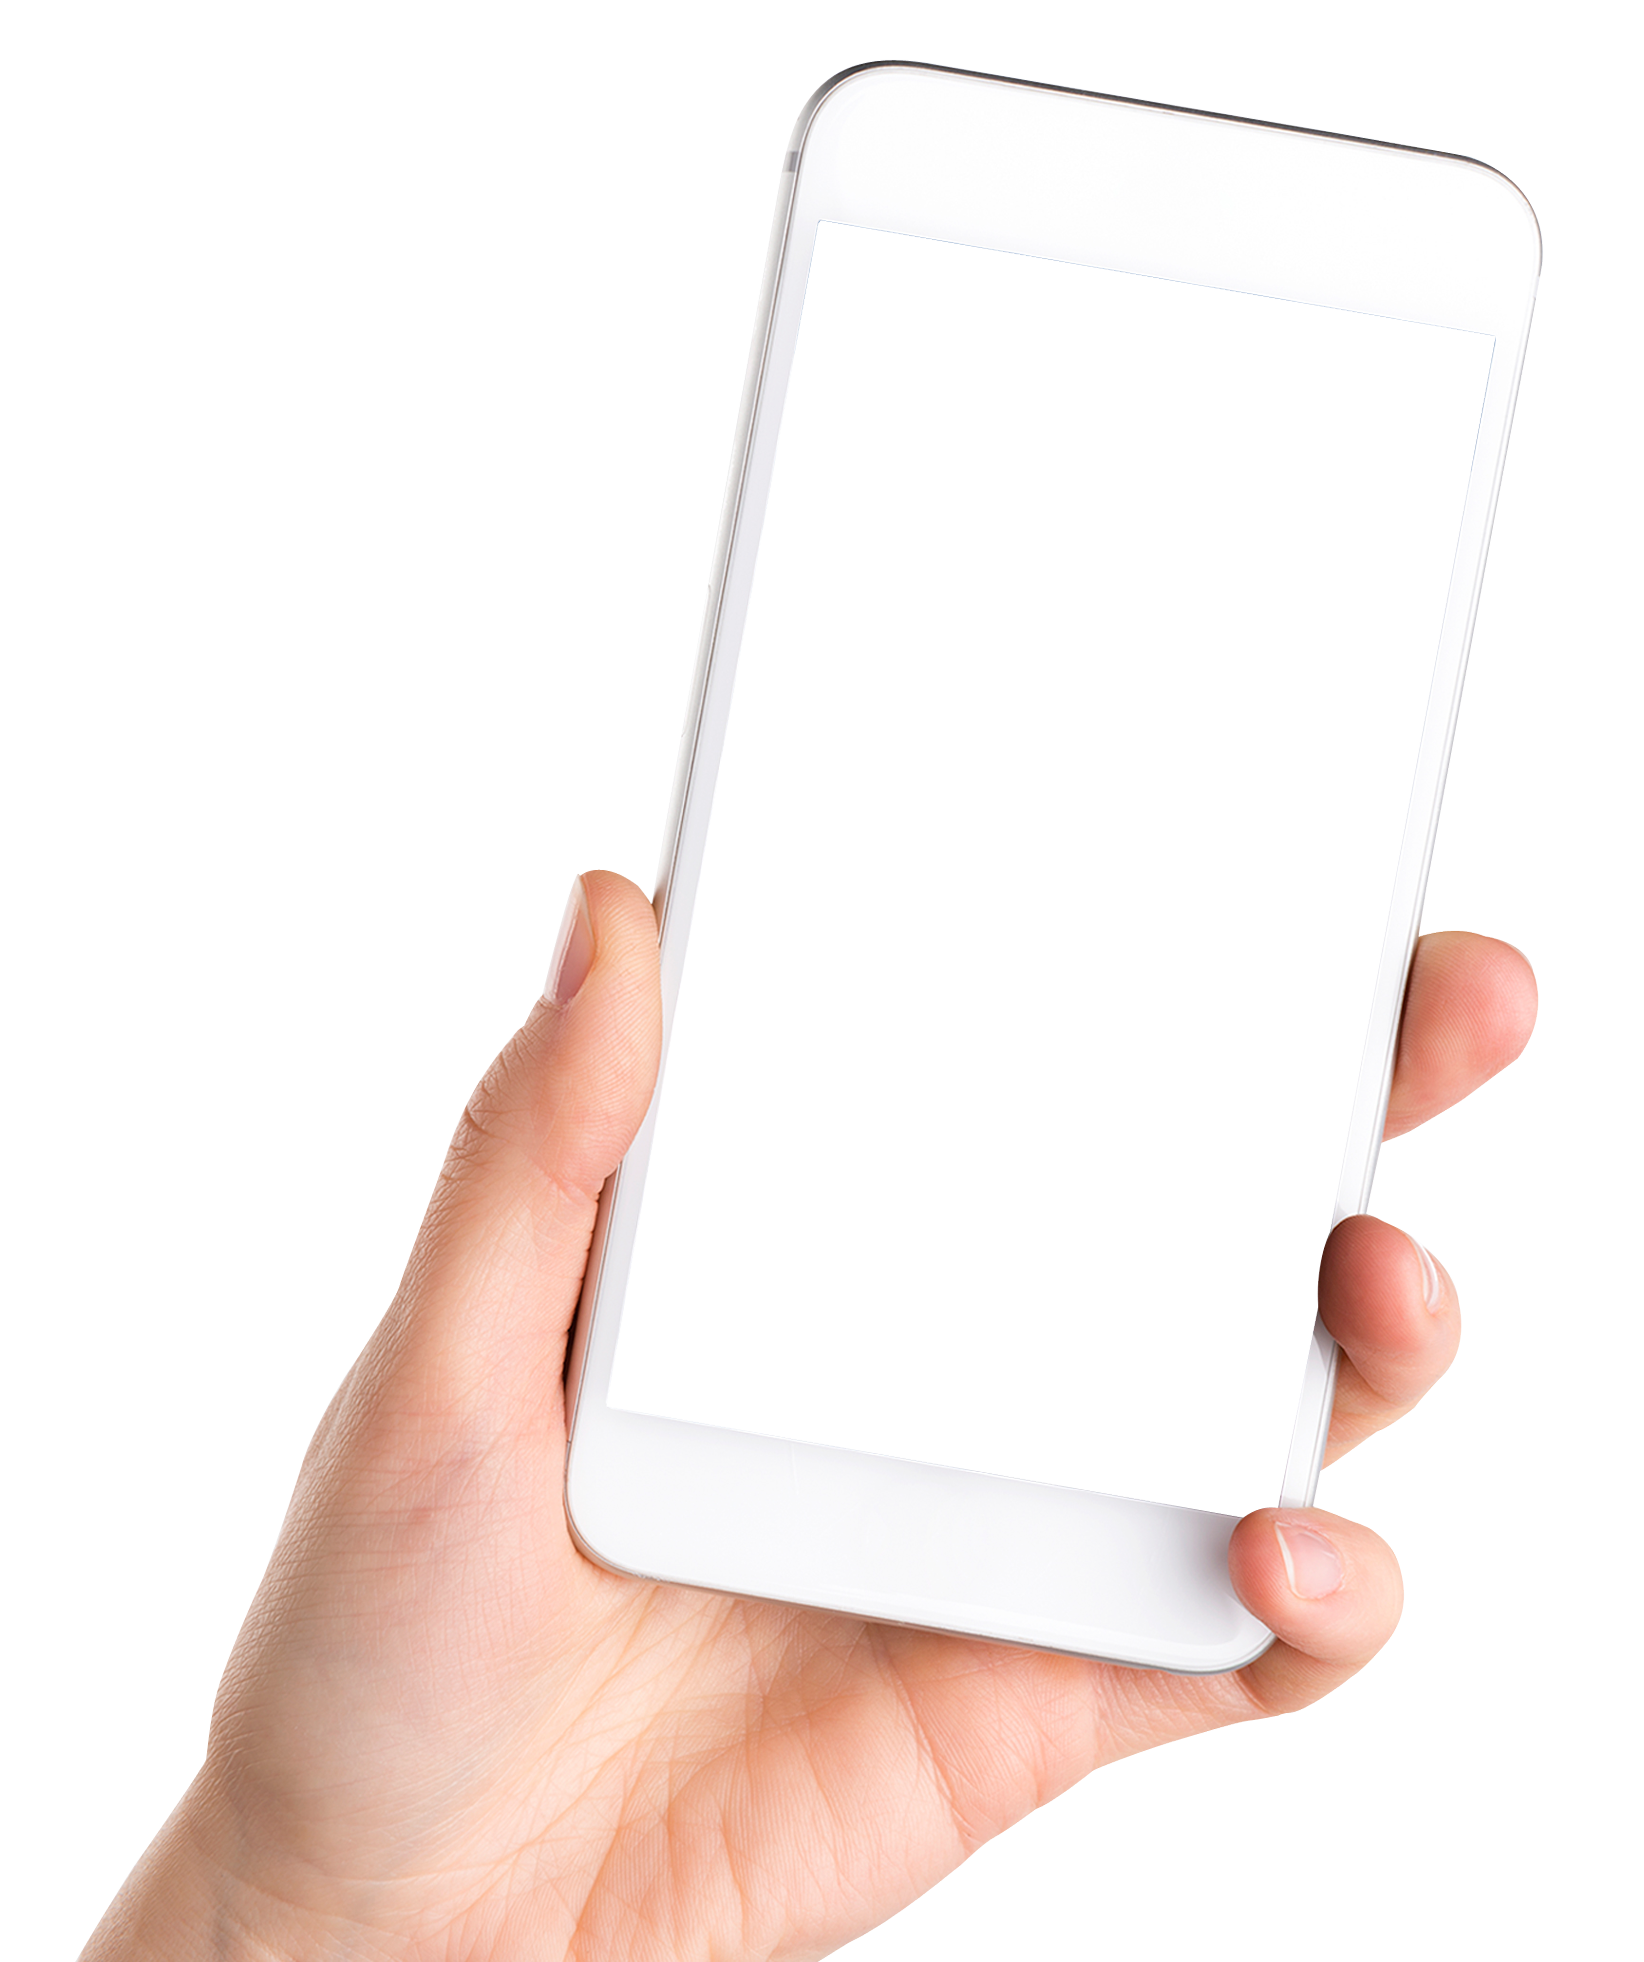 Phone In Hand PNG Image Татуаж бровей, Инстаграм